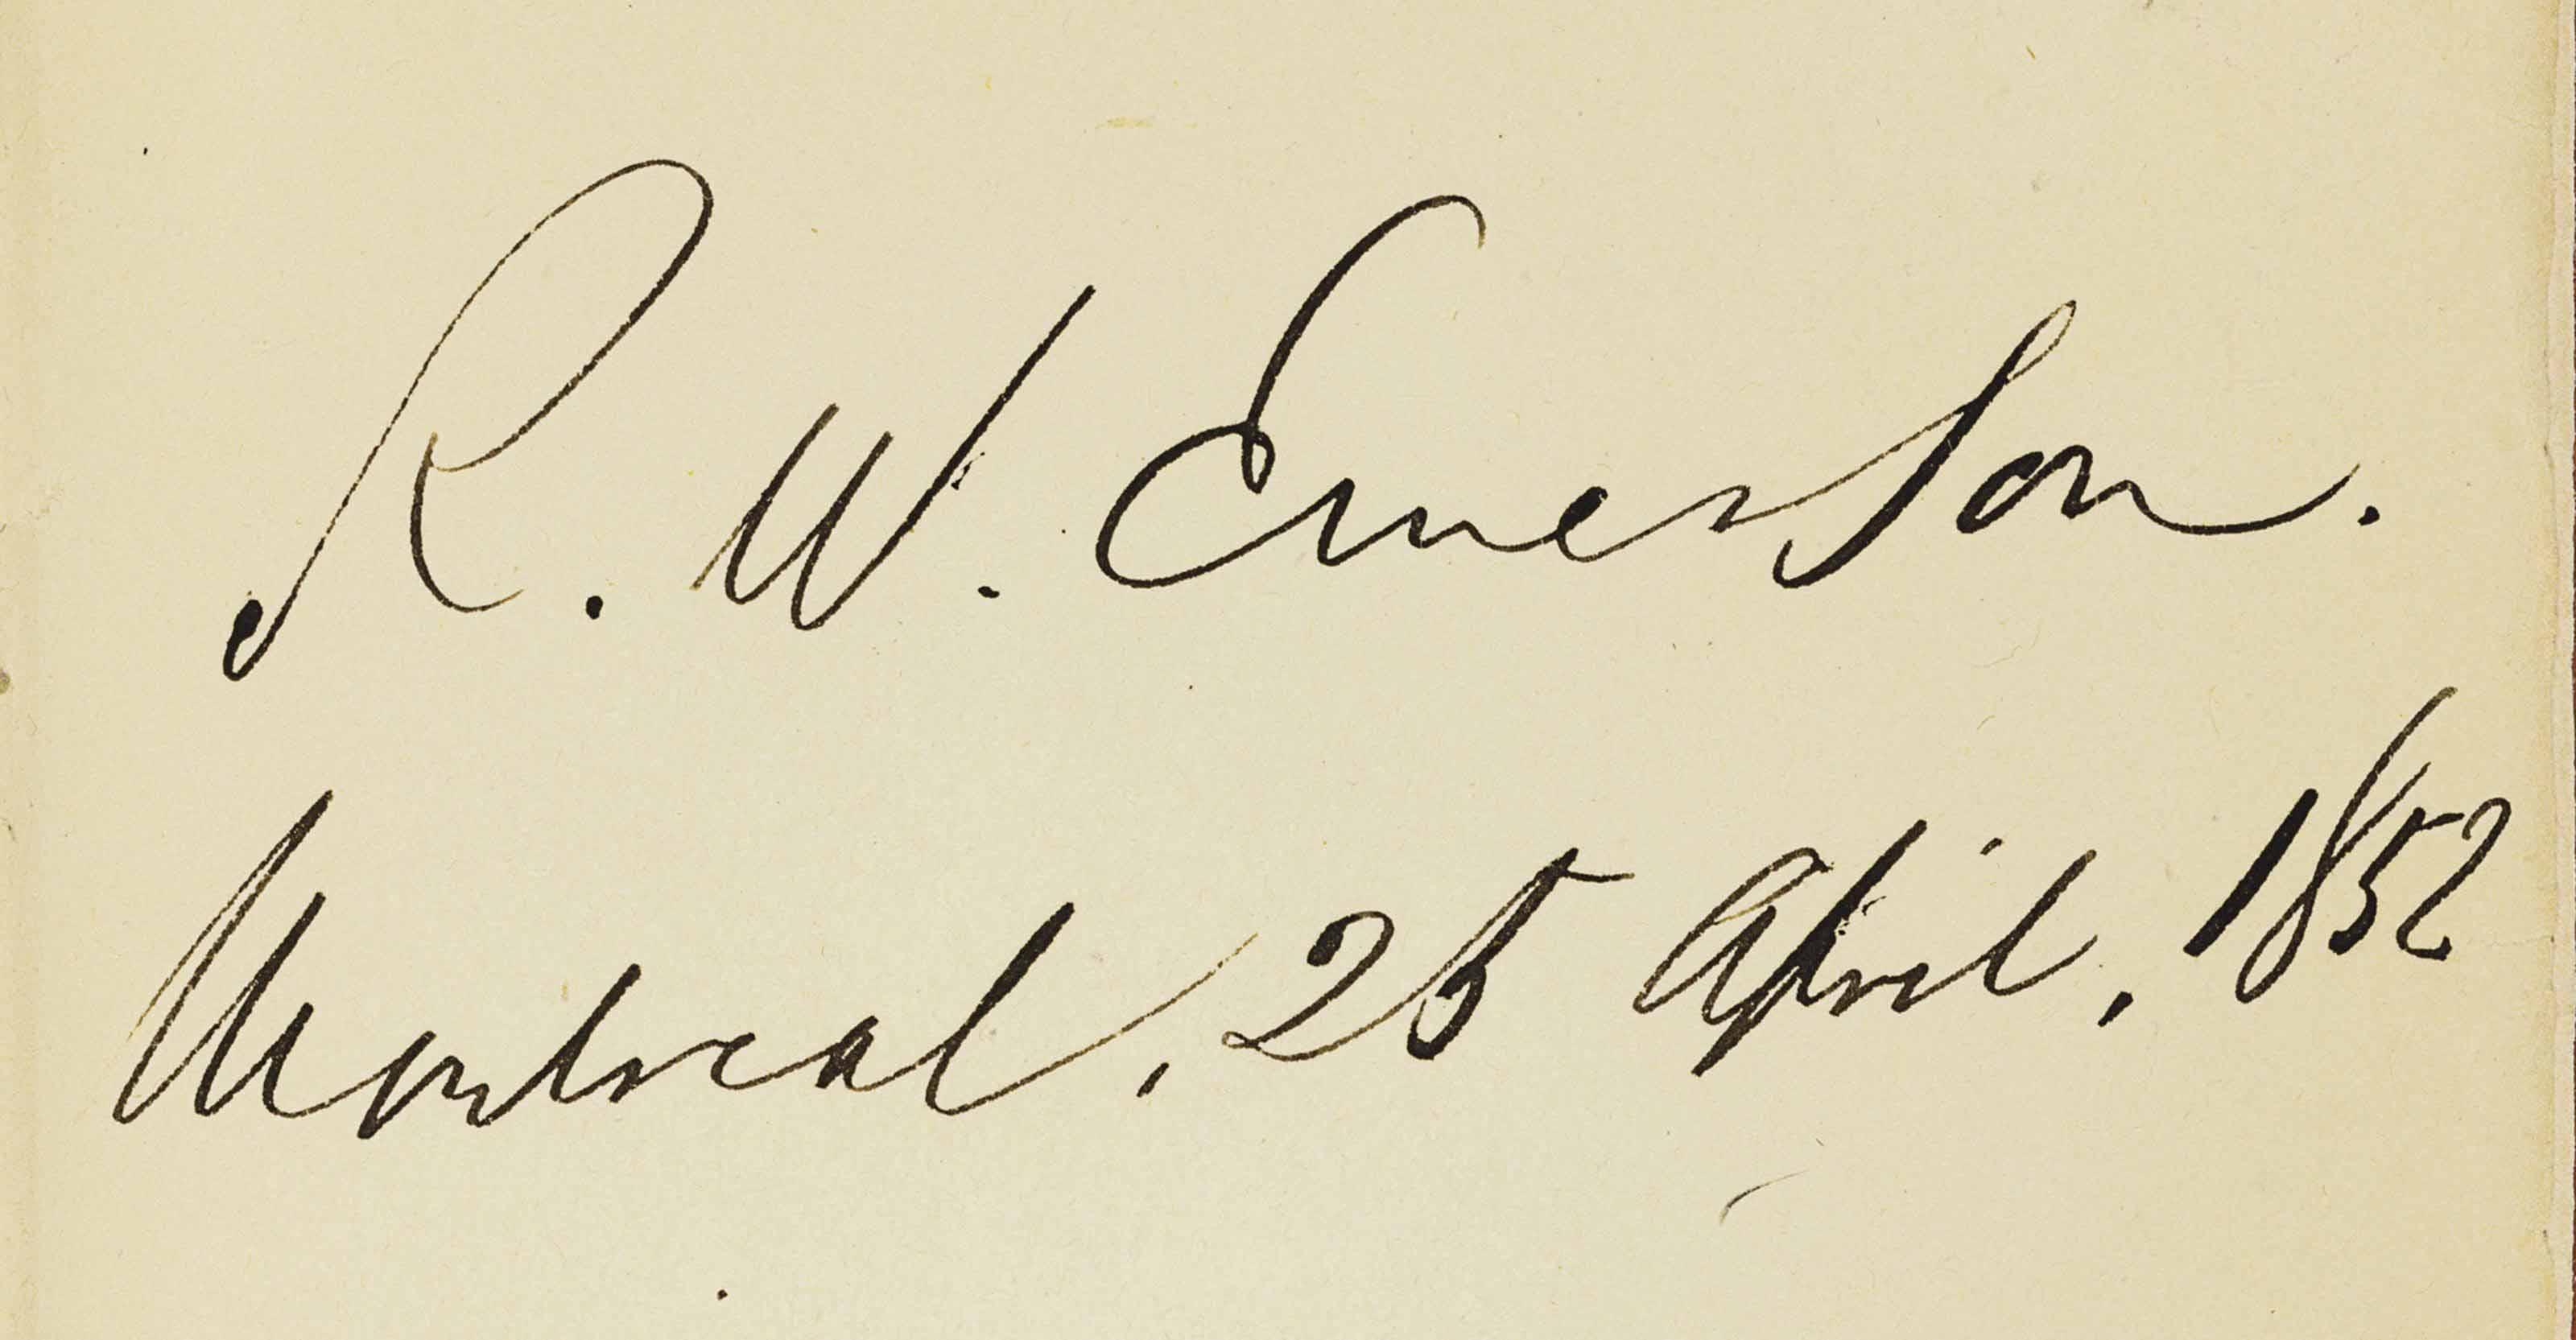 021 Essays First Series 2014 Nyr 02861 0225 000emerson Ralph Waldo Boston James Munroe 1850 Essay Stunning Emerson Pdf Shelburne Publisher Full